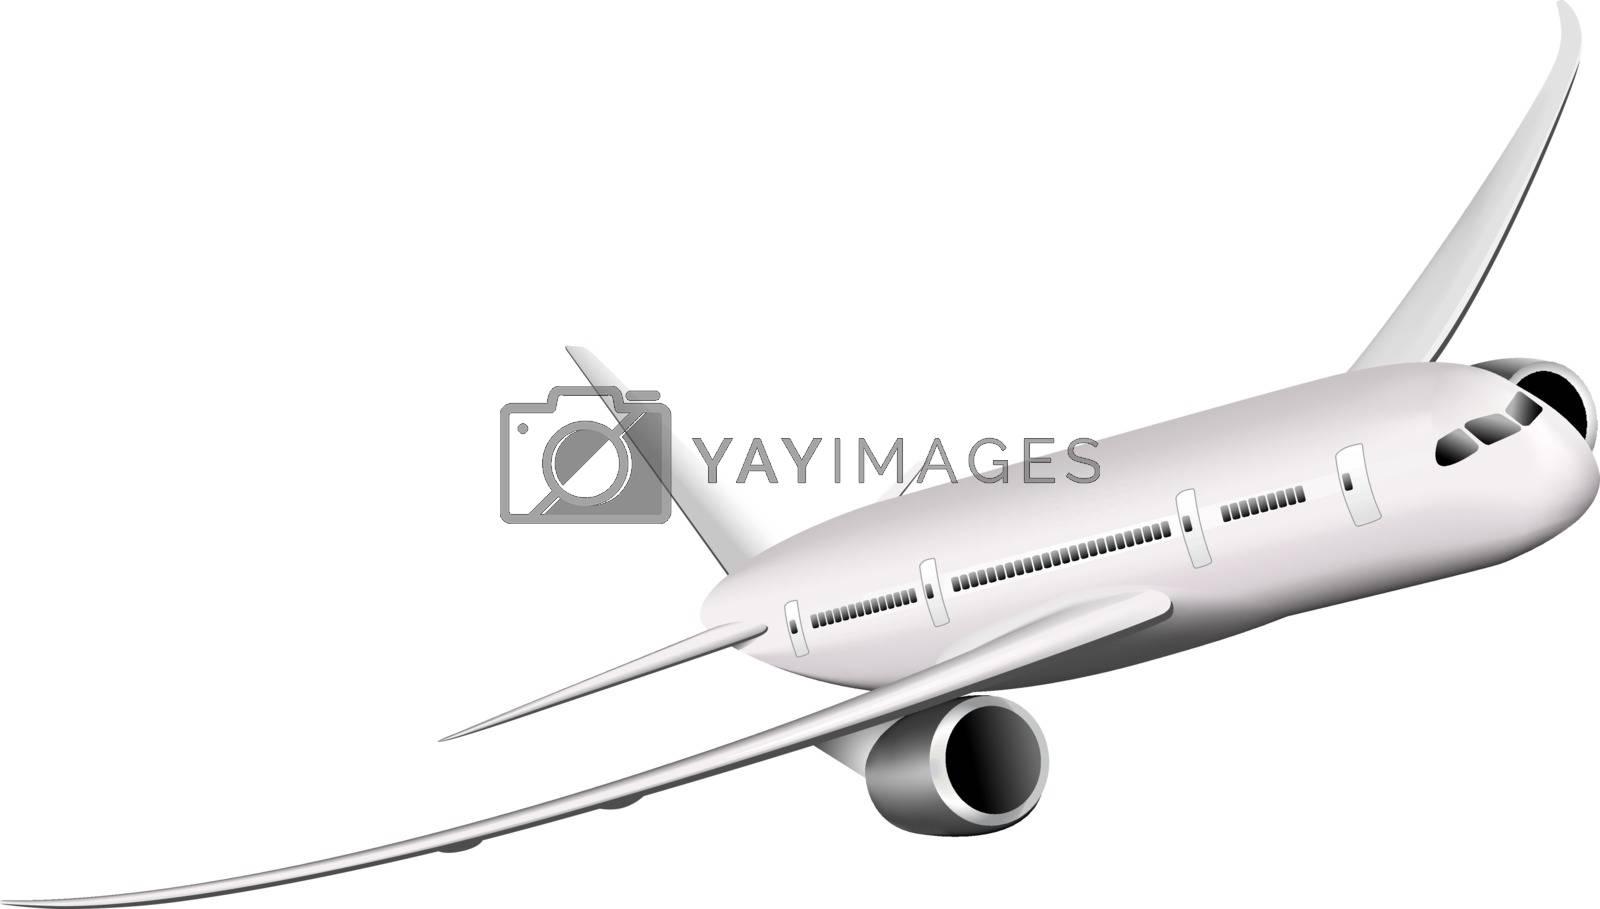 Passenger airplane on a white background. Large modern airliner. Vector illustration.